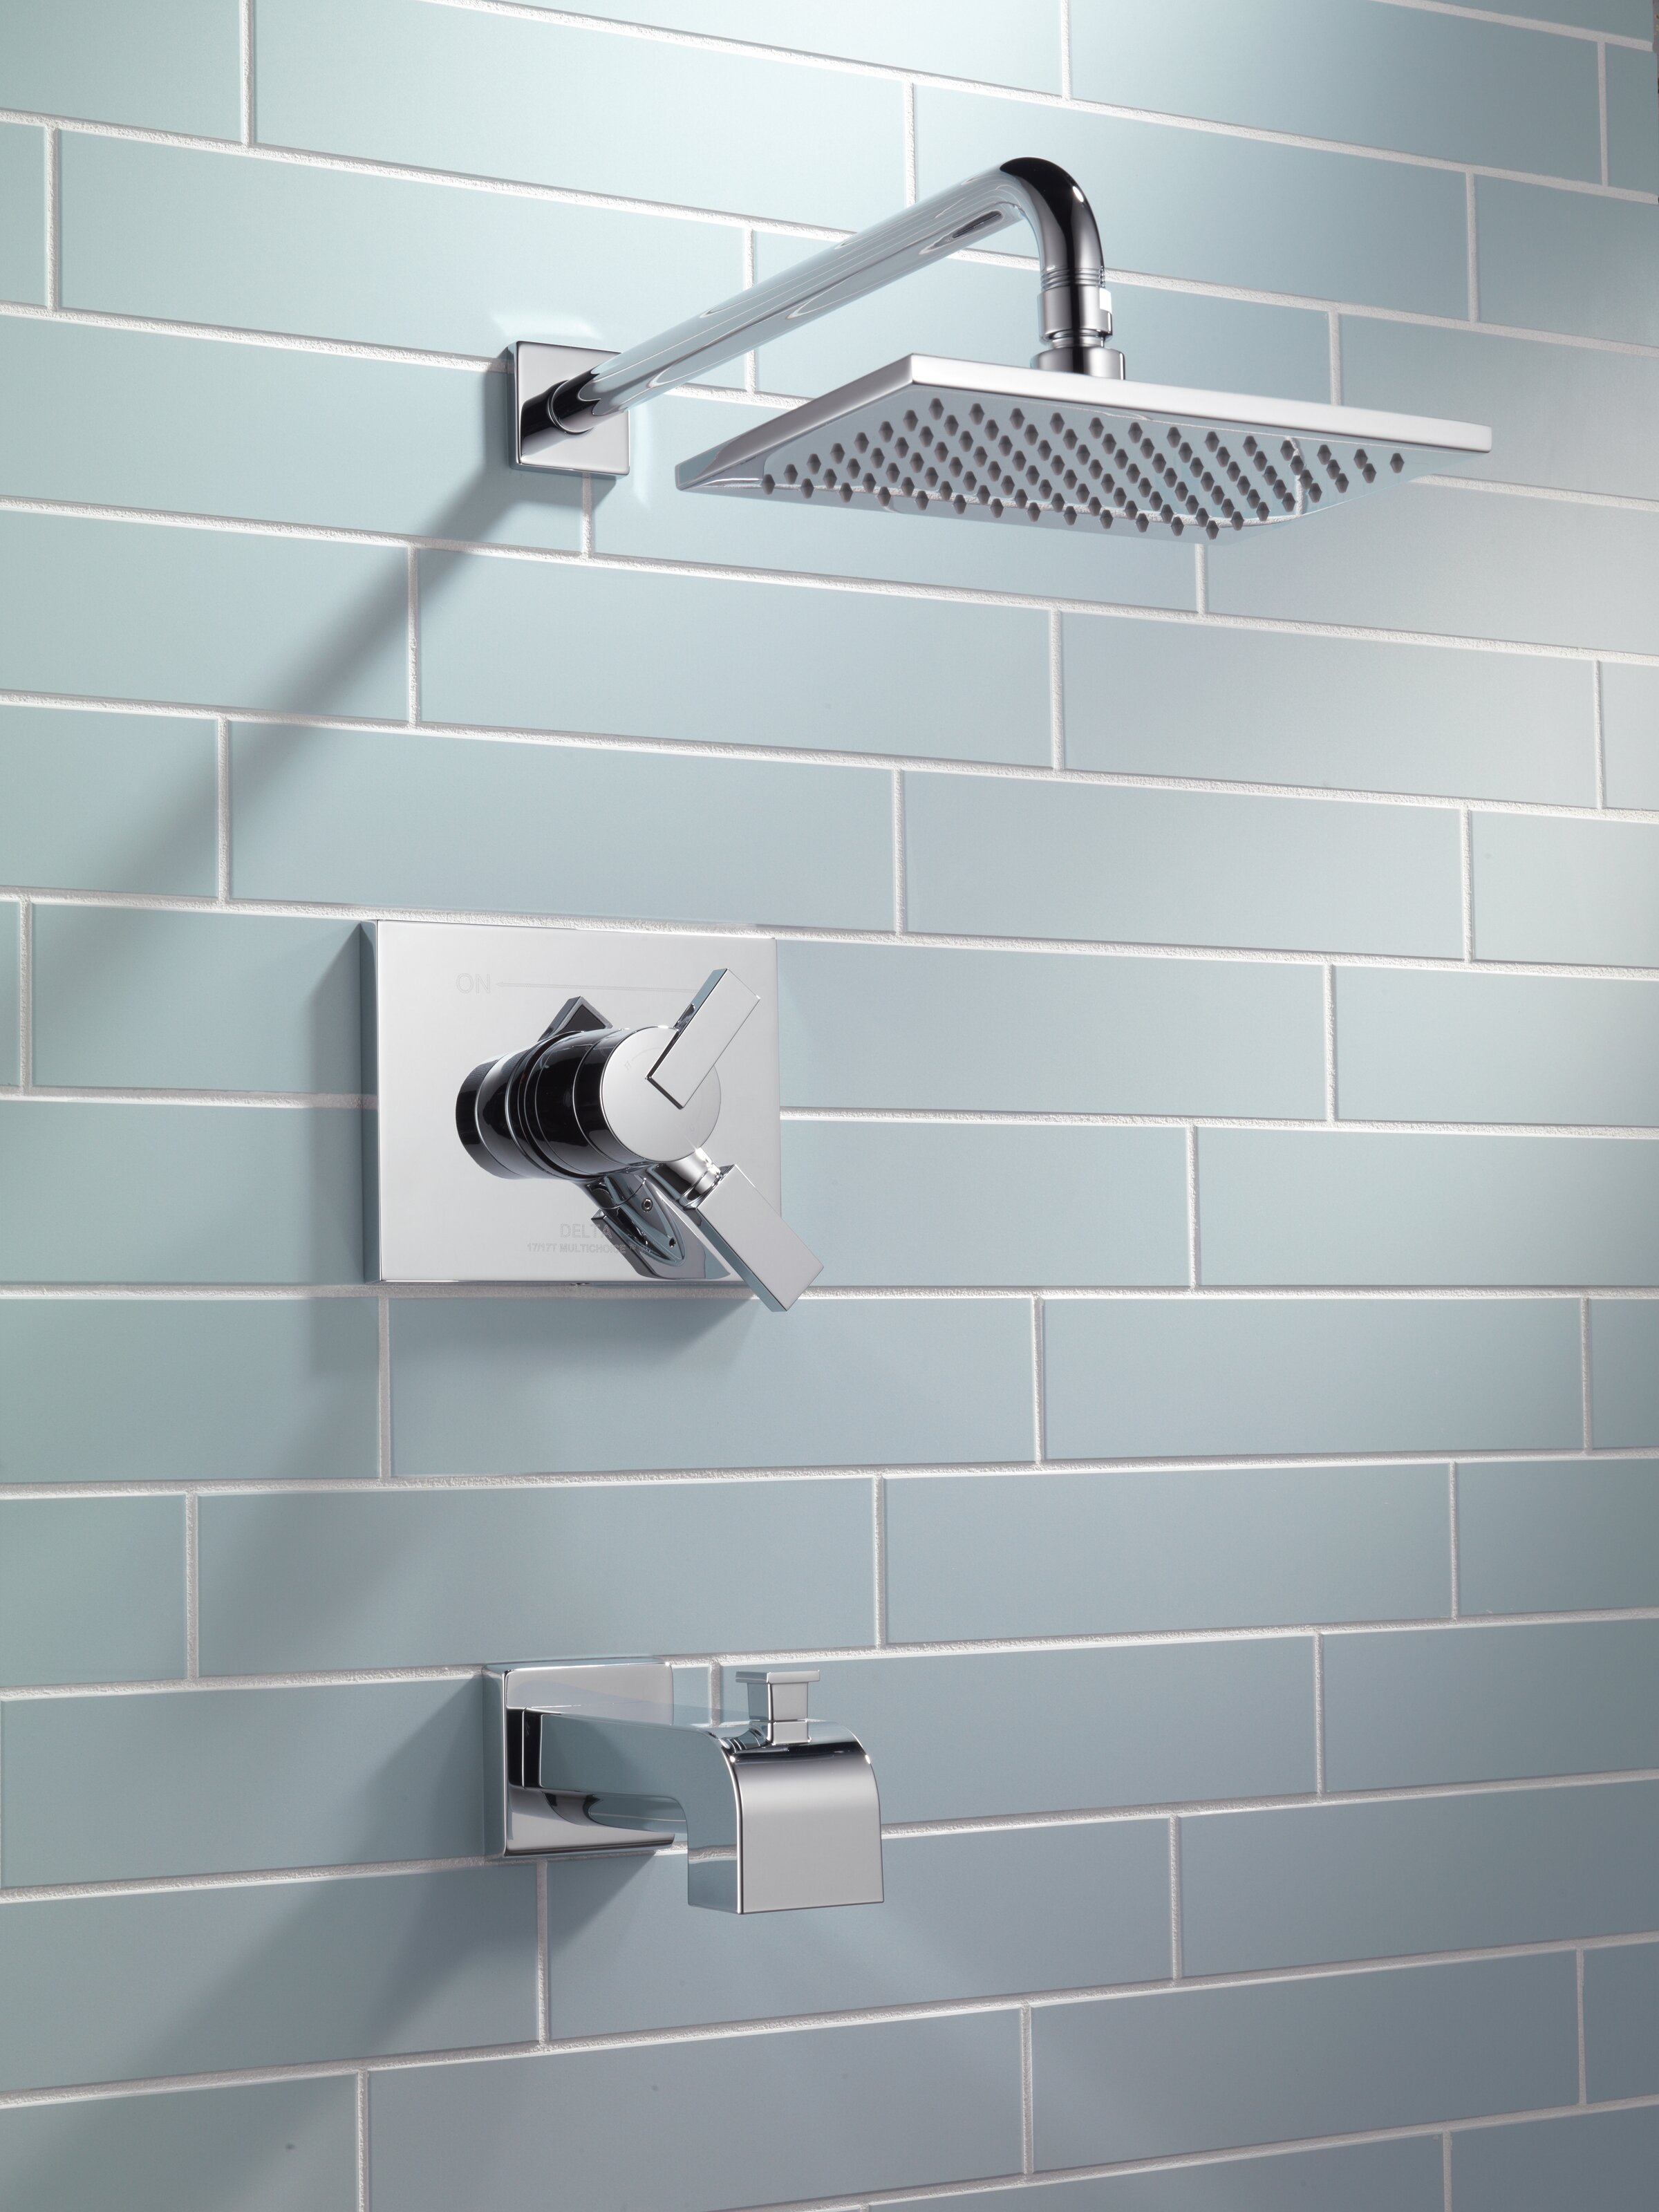 T17453 Ss Cz Delta Vero Volume Control Tub And Shower Faucet Trim